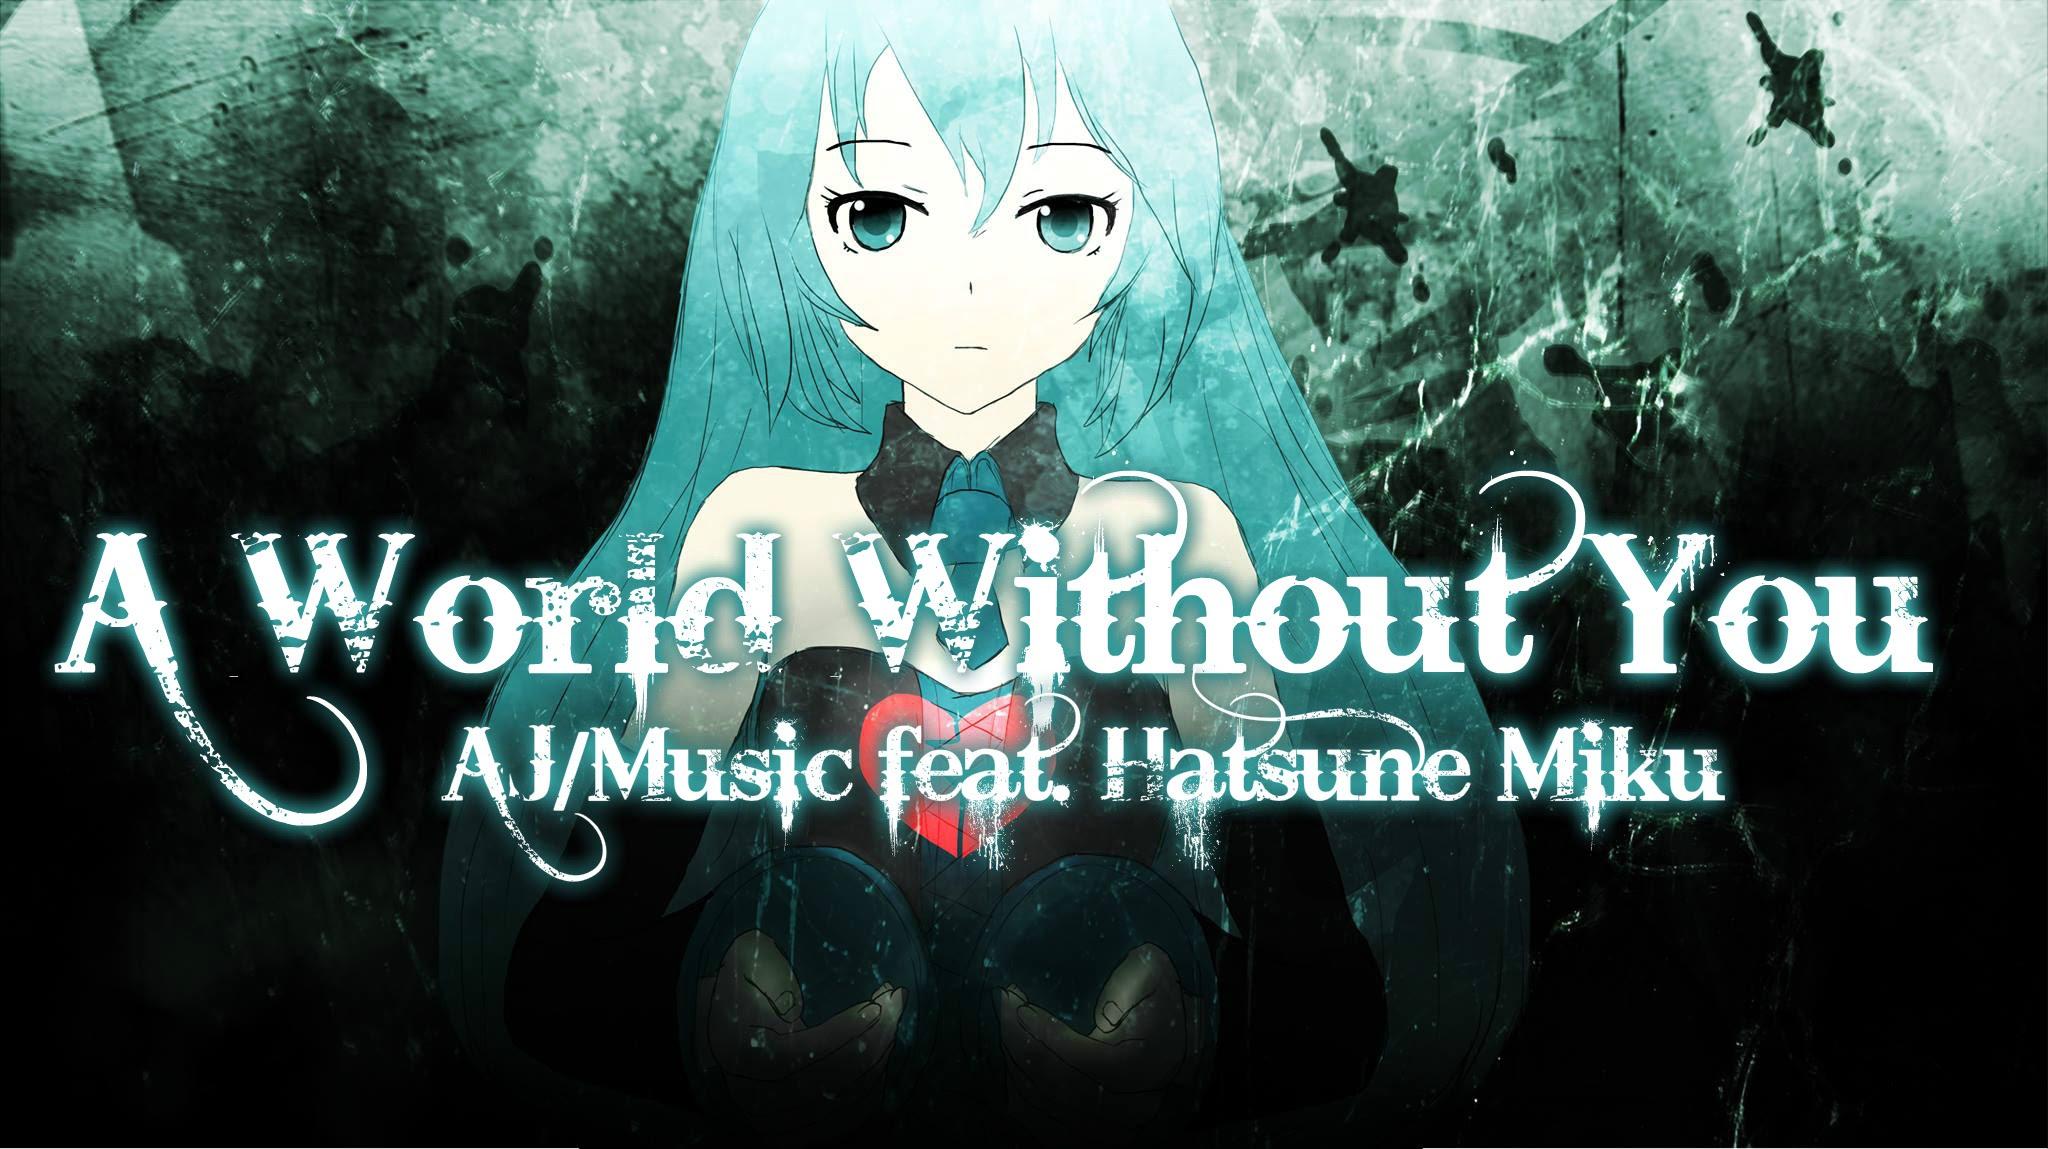 A World Without You/Anthony J. Obando